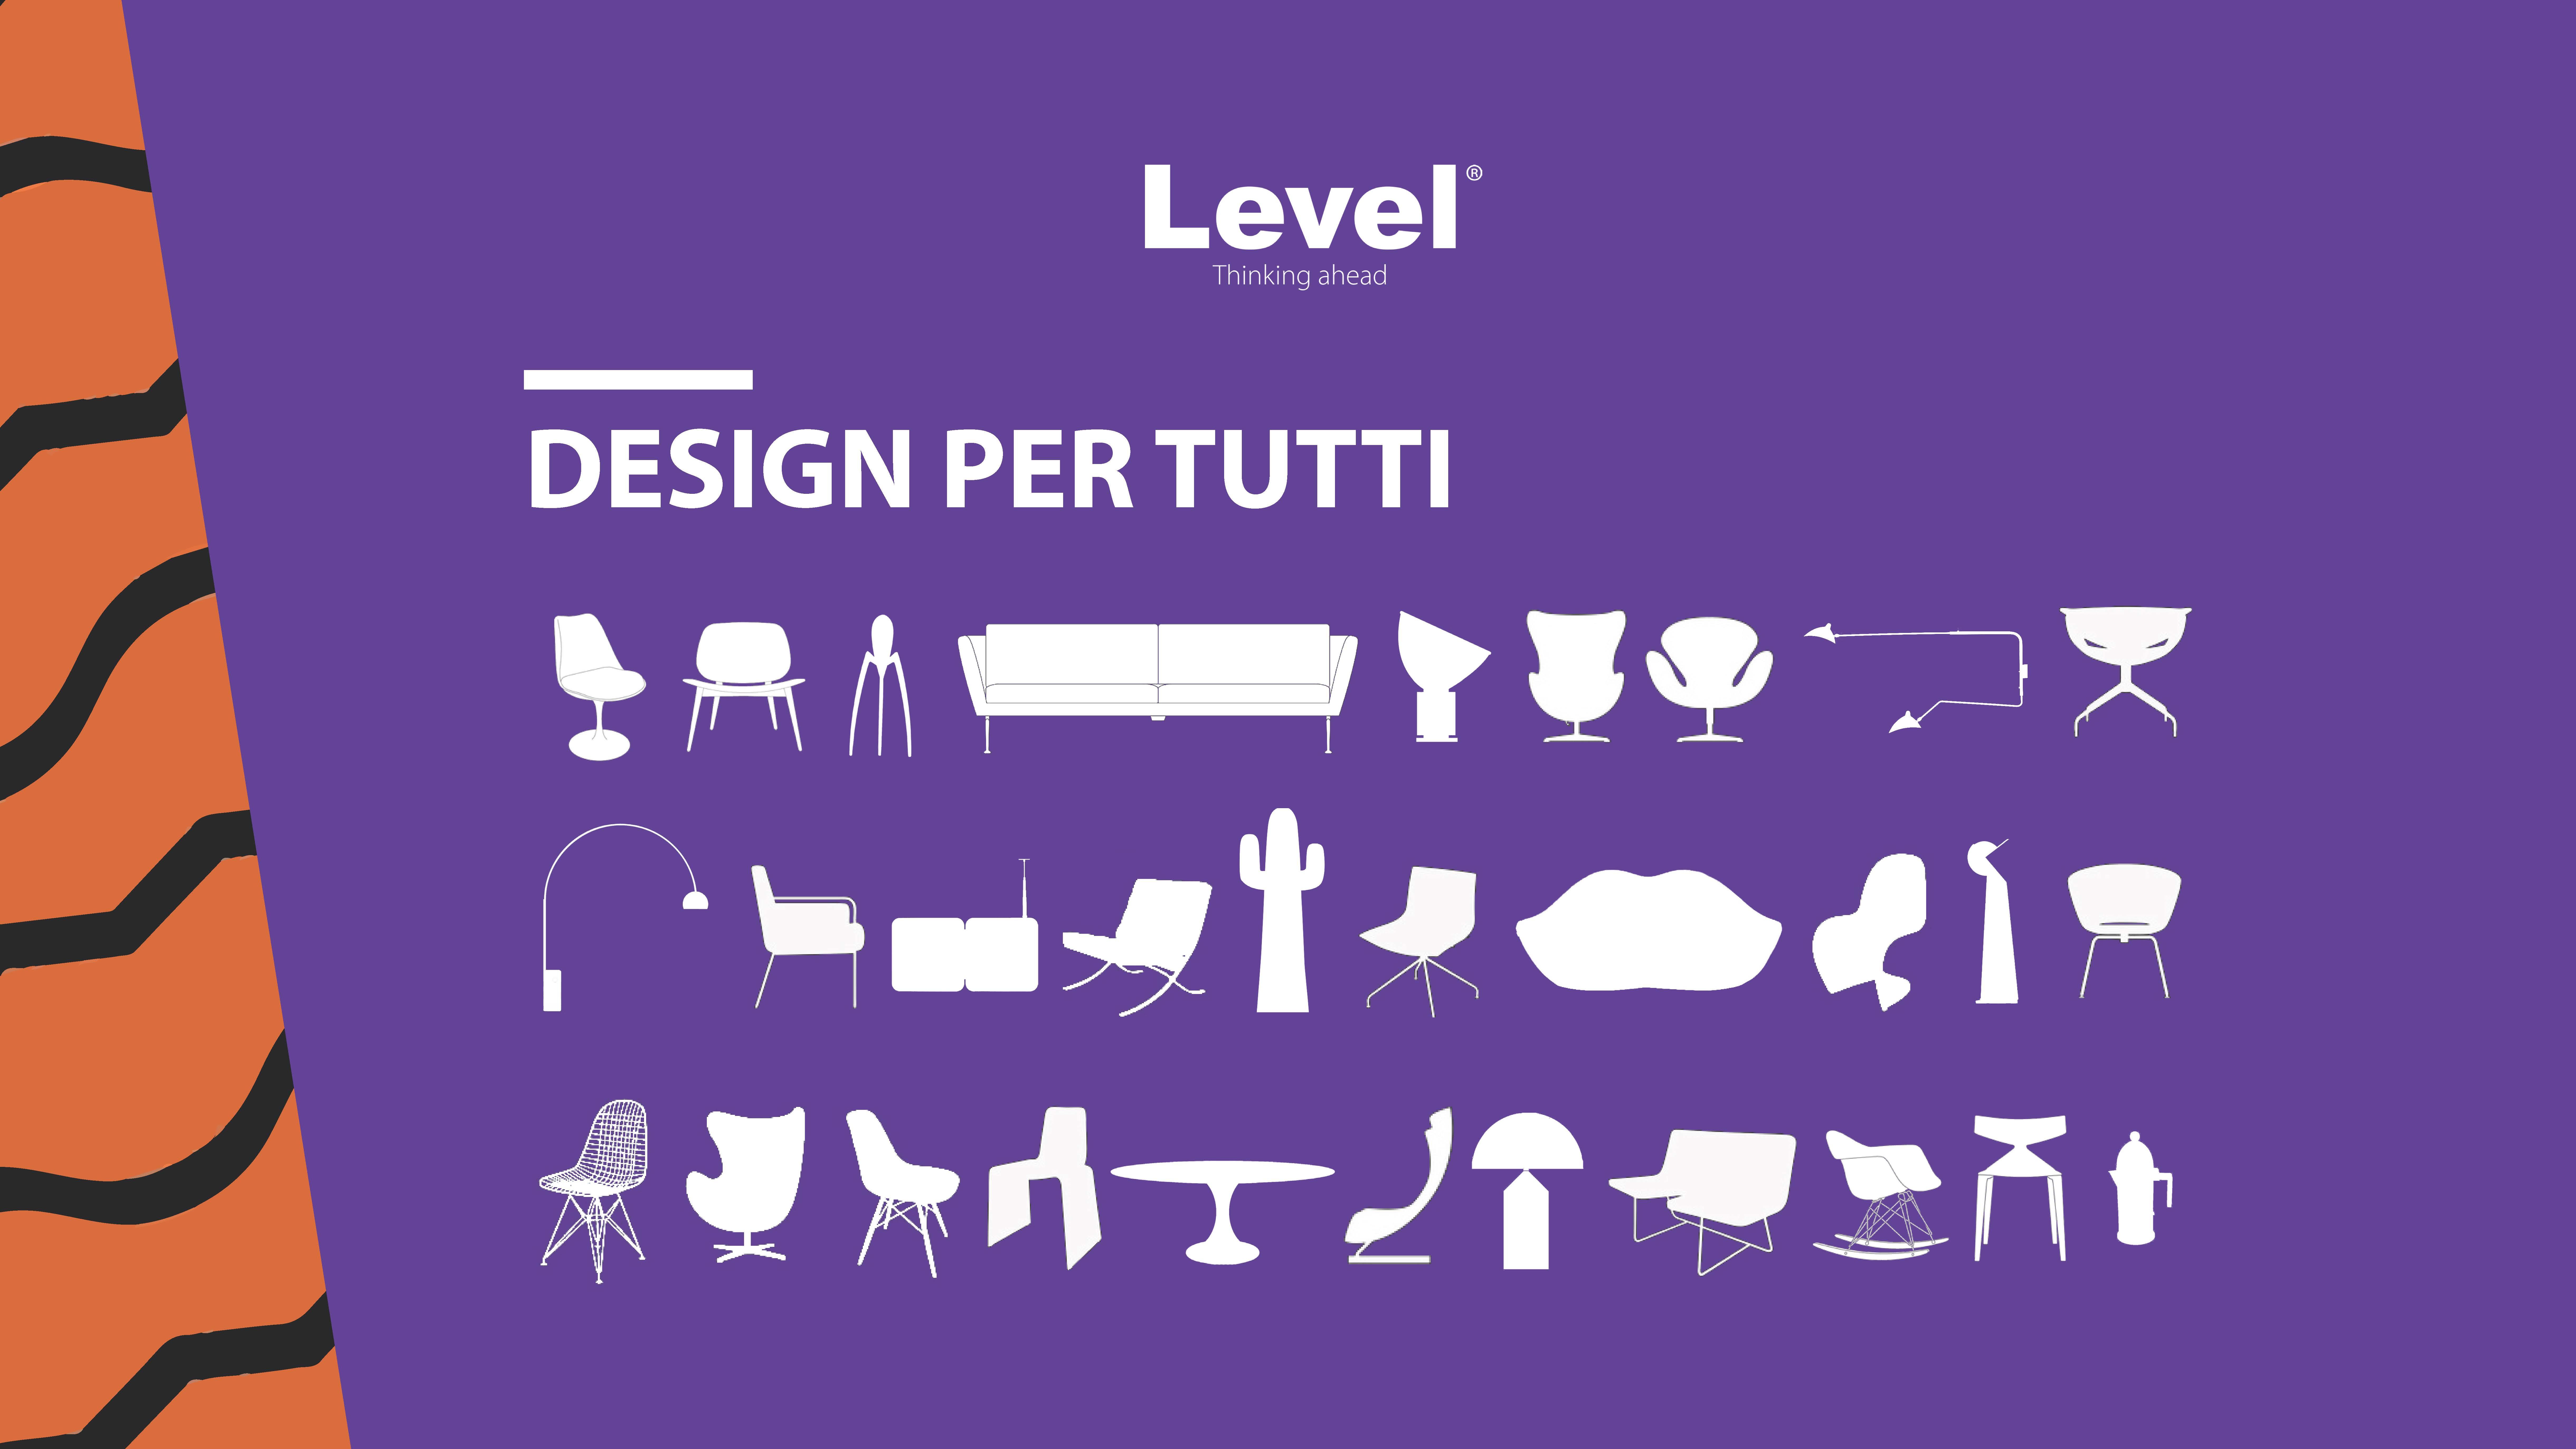 Design Per Tutti Com design per tutti, four evenings to talk about design